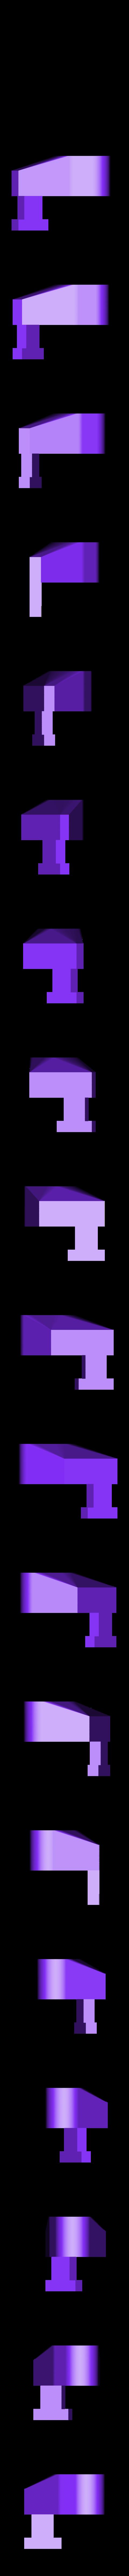 Anycubic_I3_Mega_Filamentrollenhalter-FilamentSensorHalterung.stl Download free STL file Anycubic I3 Mega Spool Holder • 3D print object, dede67